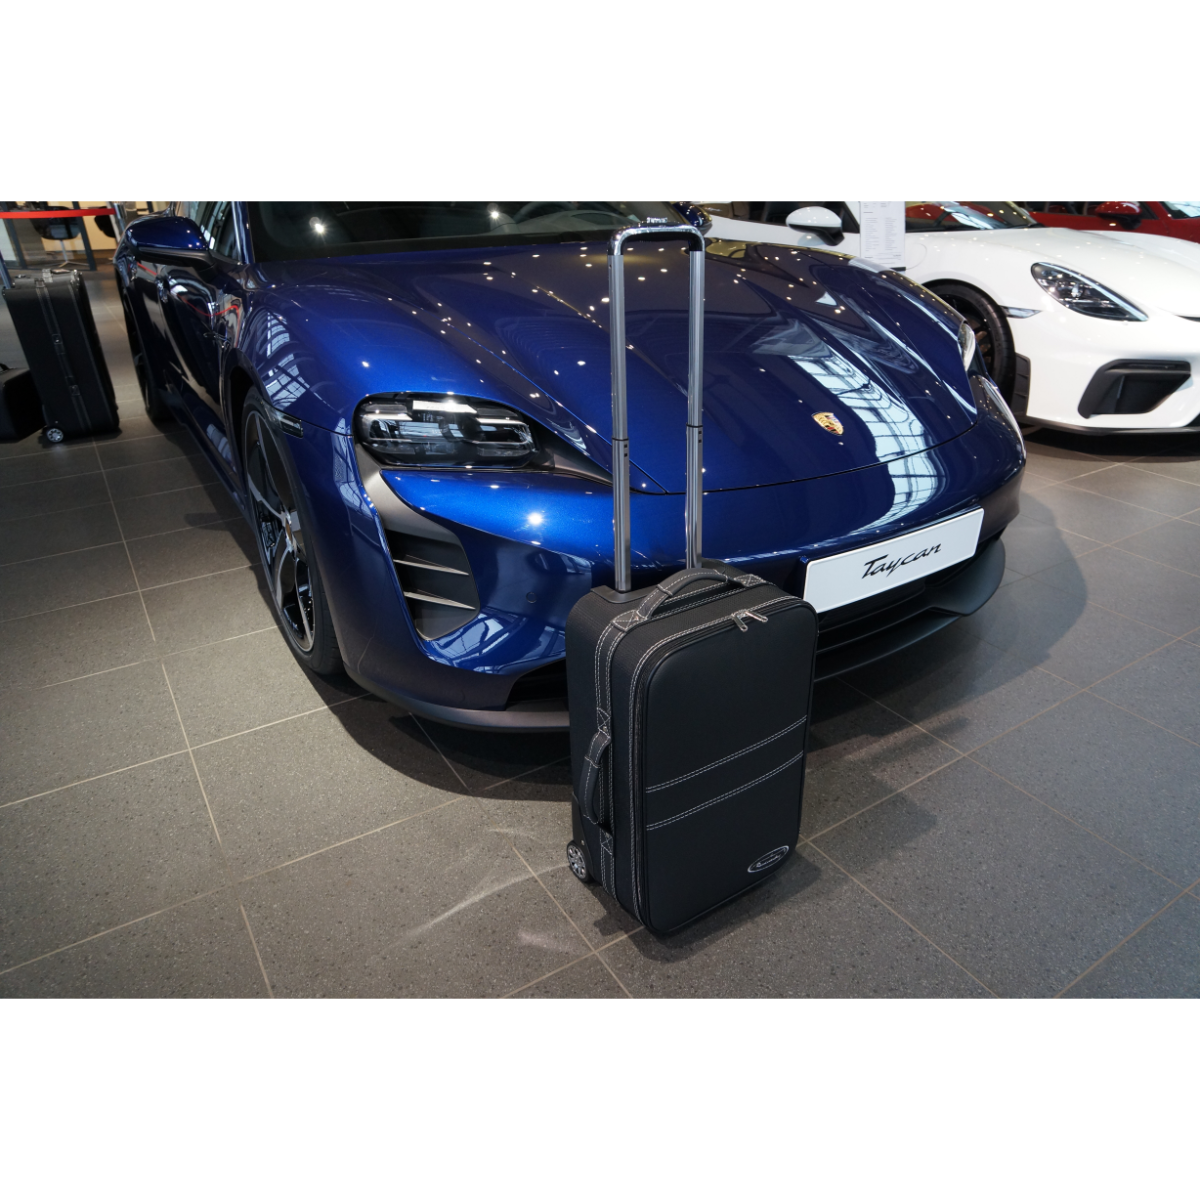 1-tlg. Kofferset Porsche Taycan front (133F) - Leder / Nylon